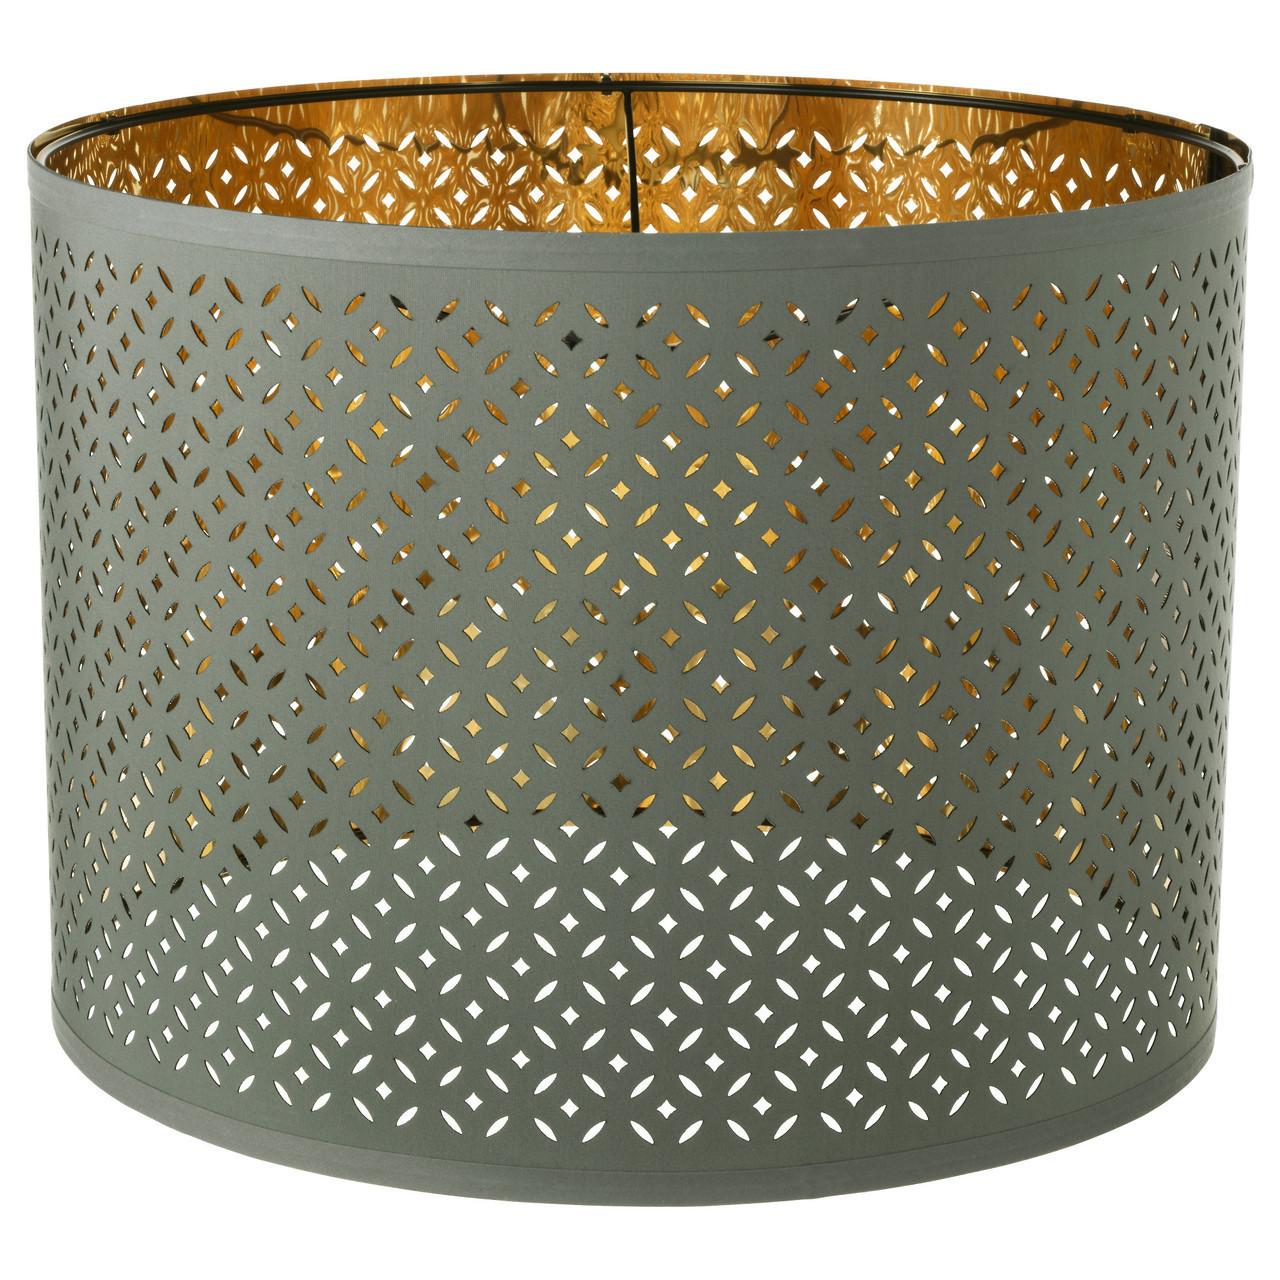 Абажур (плафон) для лампы IKEA NYMÖ 44 см цвет латуни 703.772.16